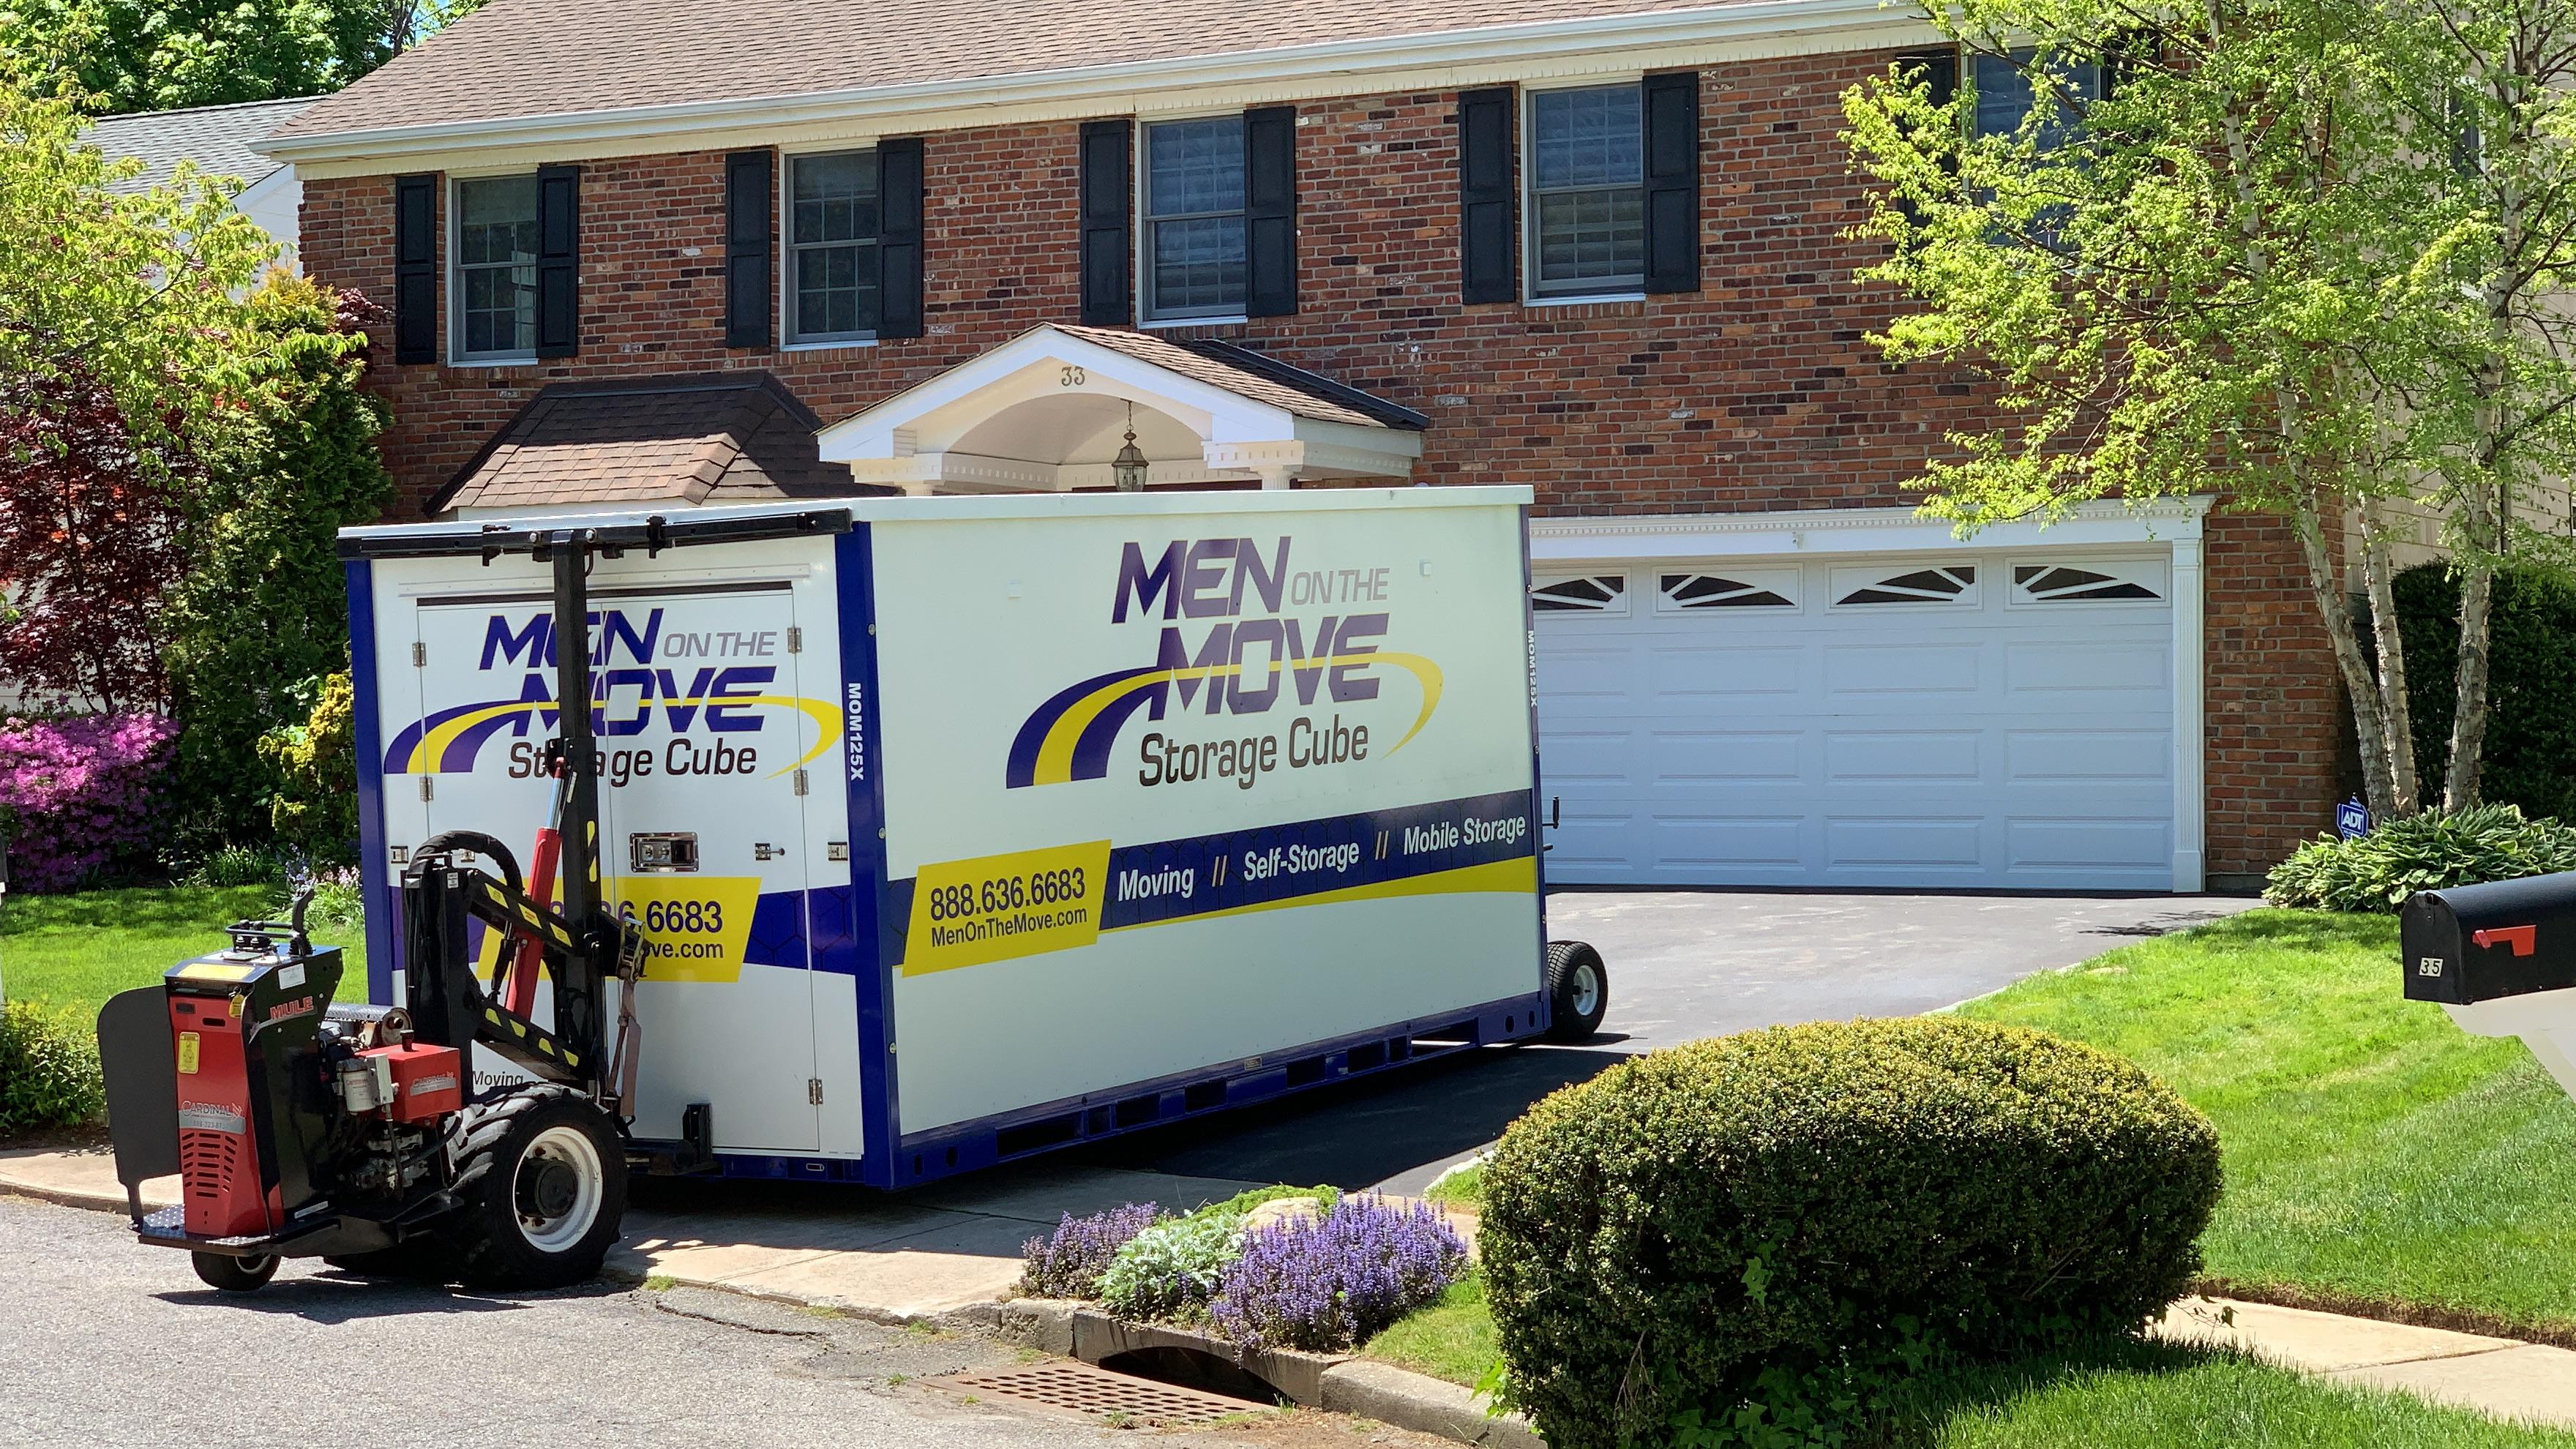 Men On The Move Storage Cube Image